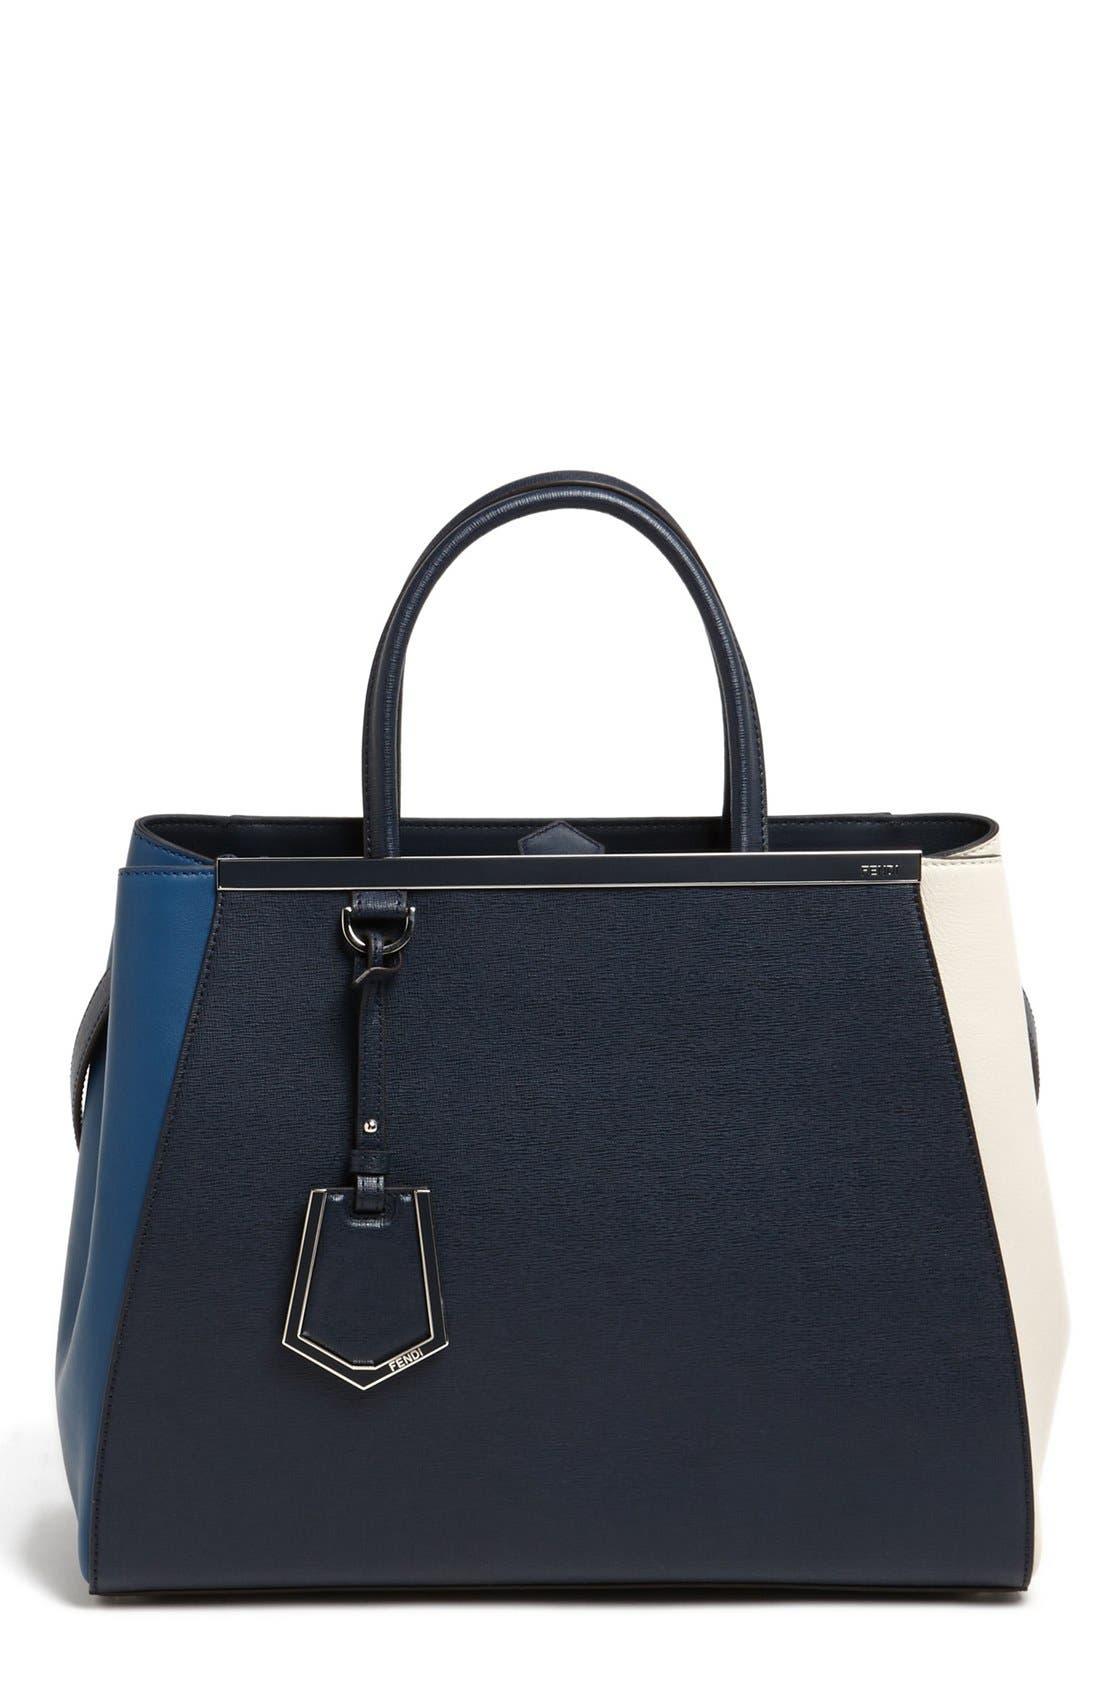 Alternate Image 1 Selected - Fendi 'Medium 2Jours Tricolor' Leather Shopper